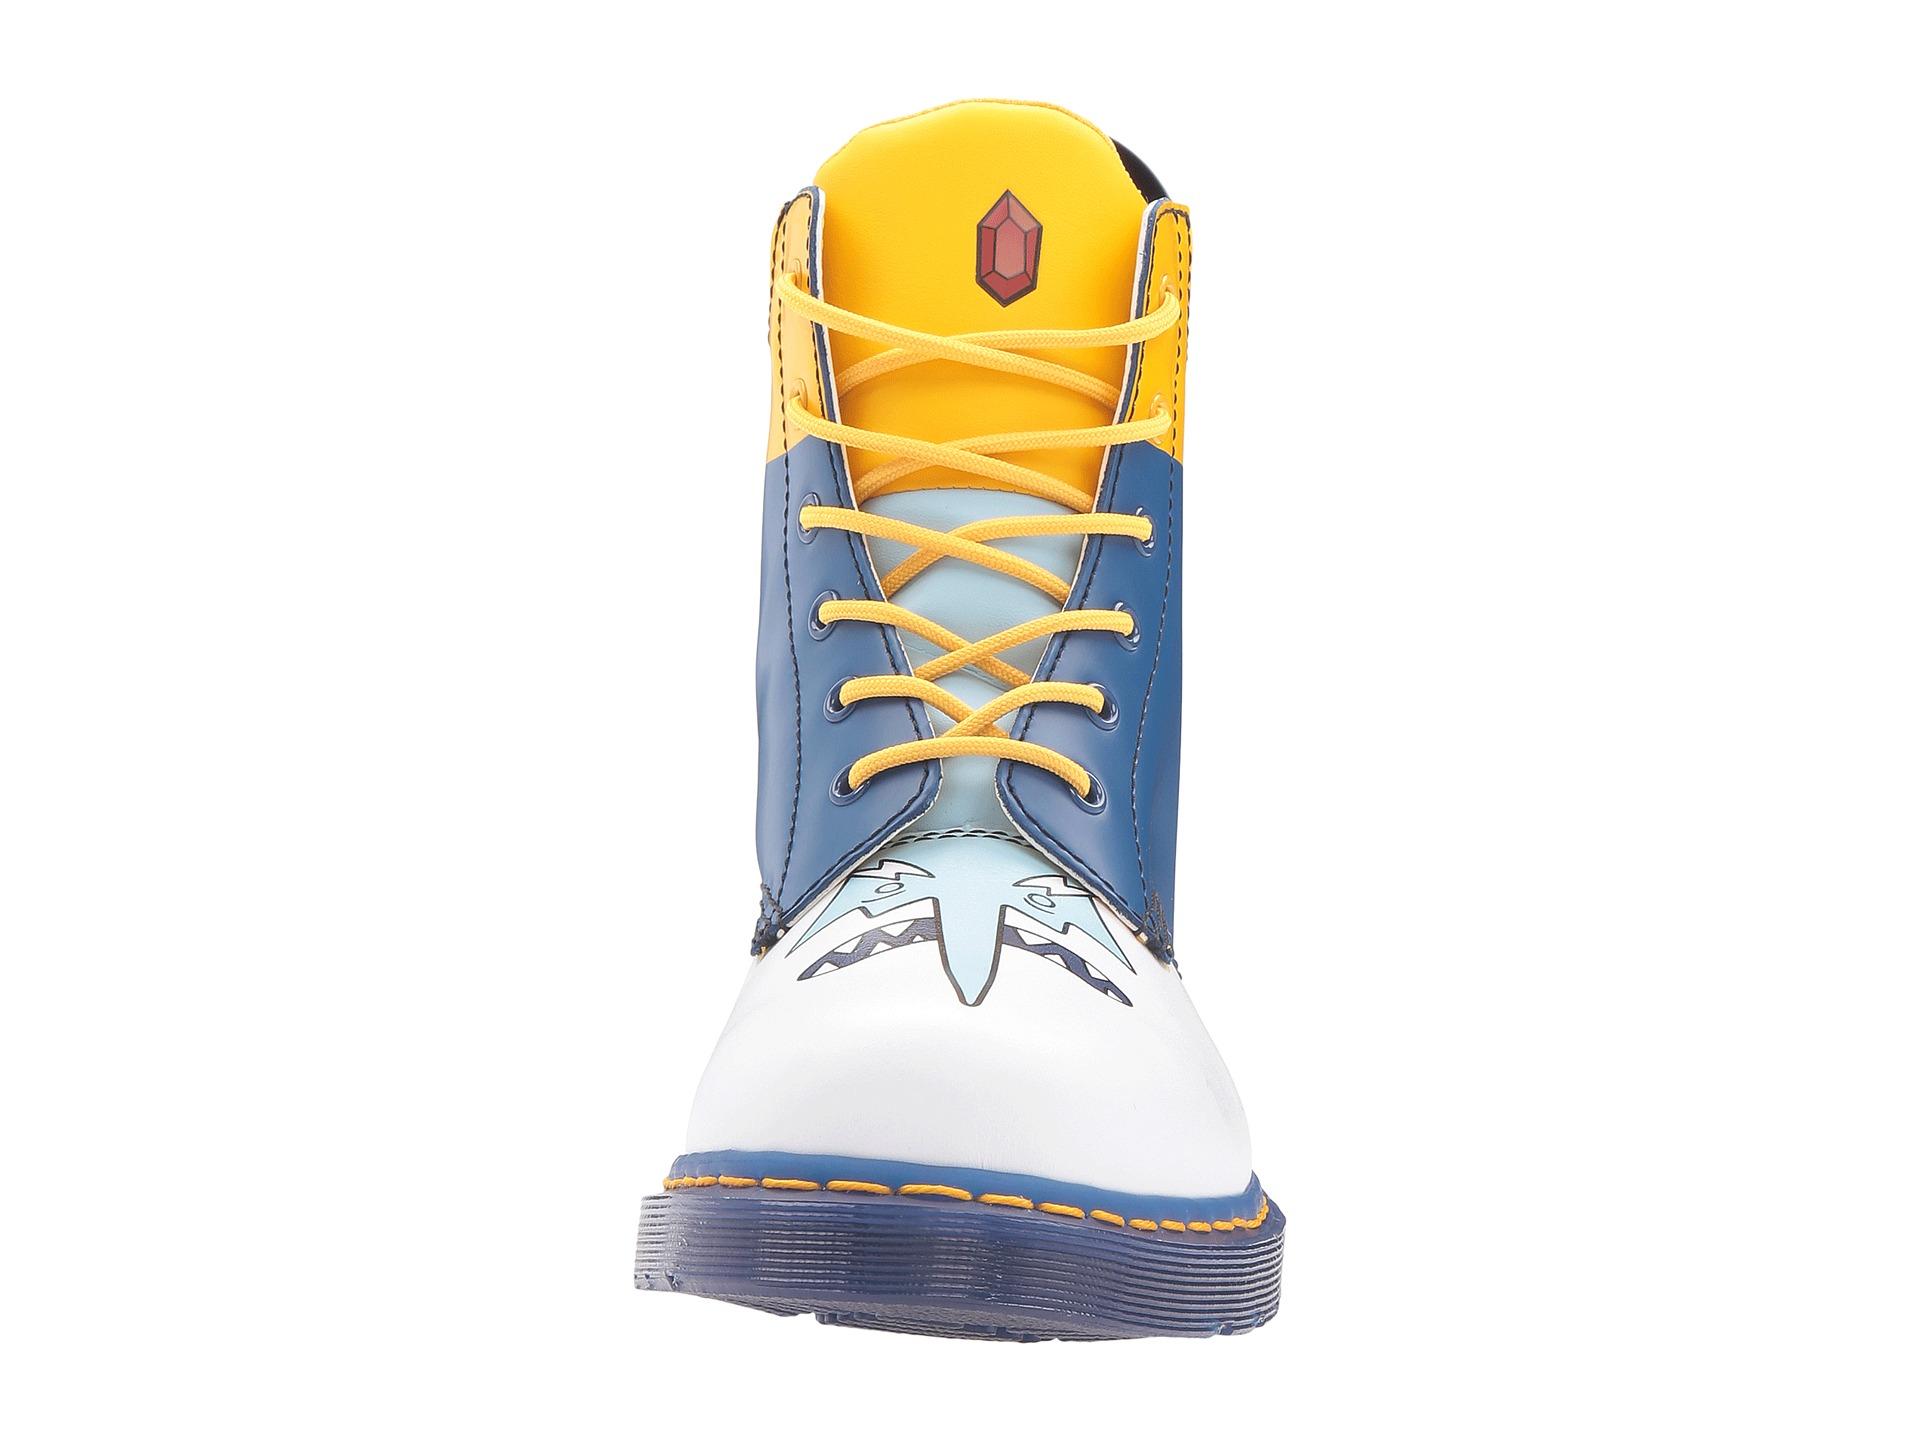 King Ice Shoe Laces